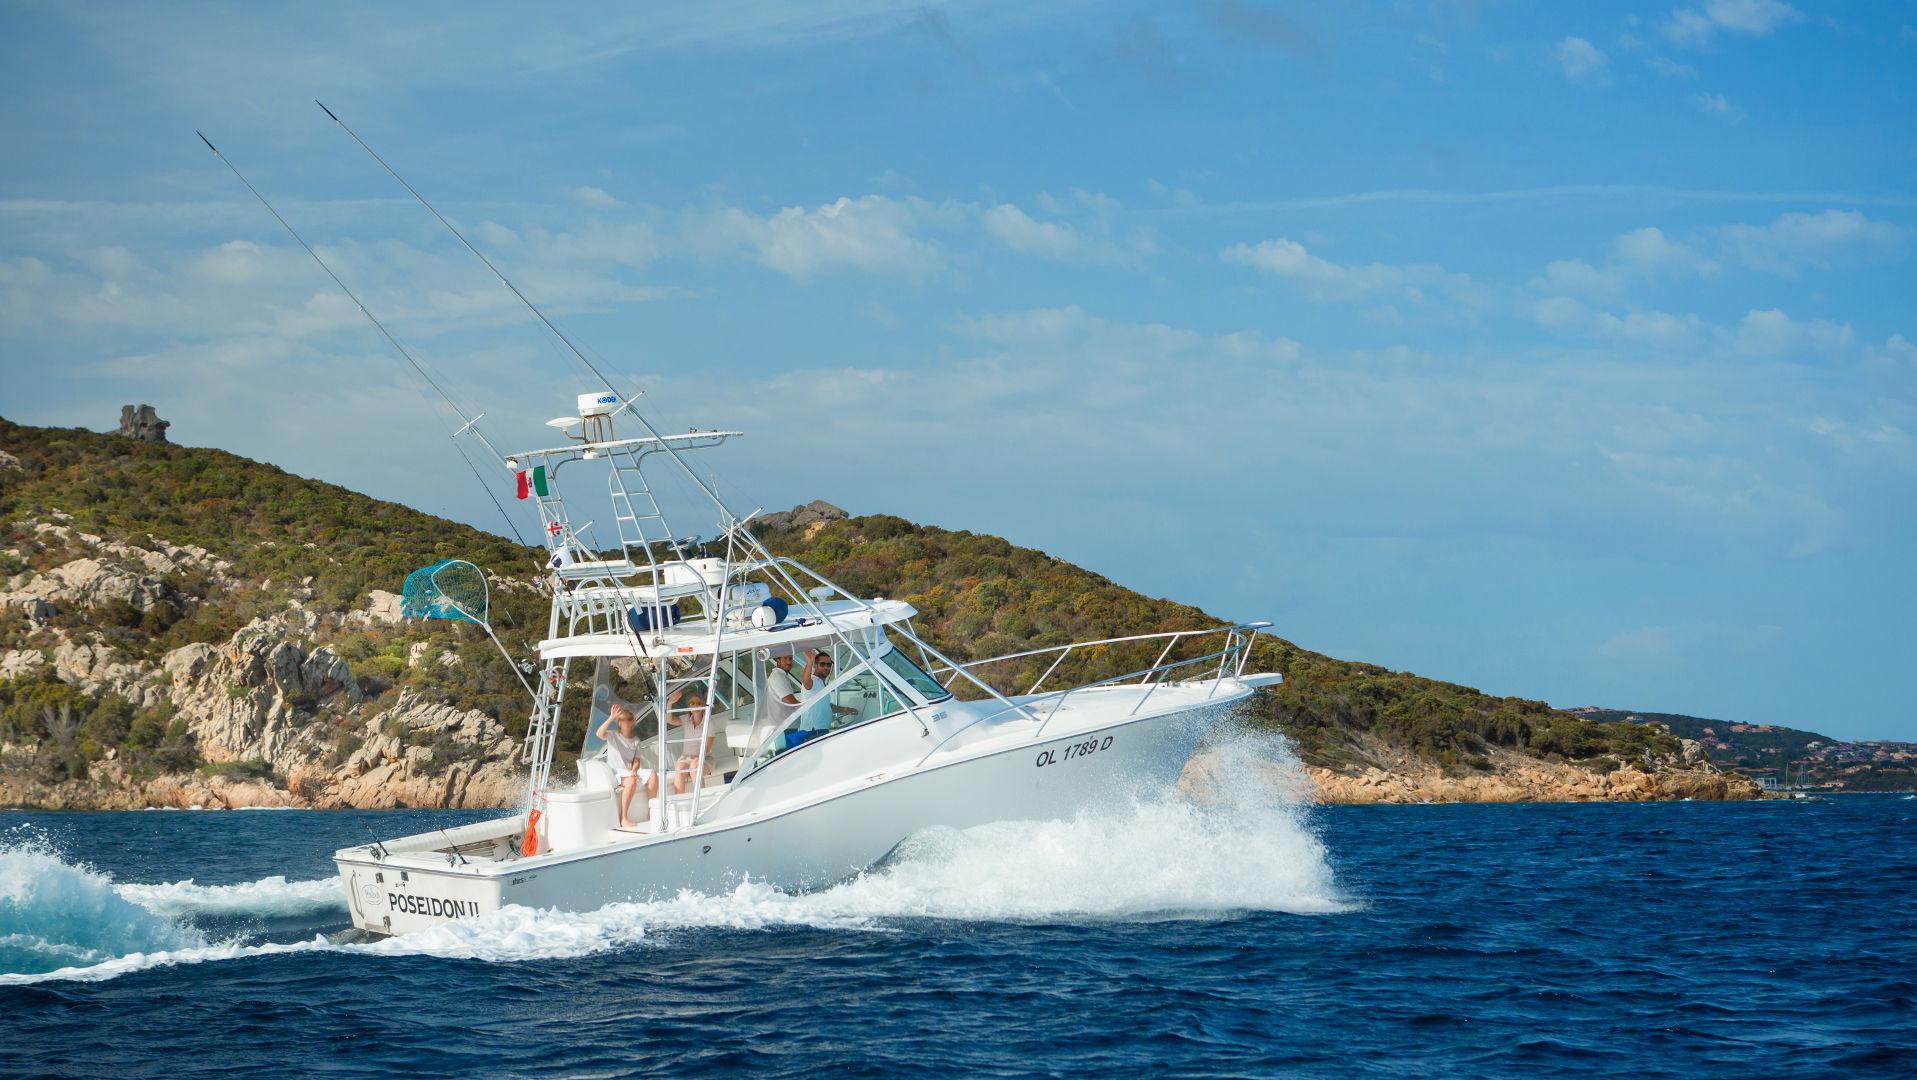 delphina-hotels-slide-charter-diporto-poseidon-fishing-palau-isola-rossa-sardegna